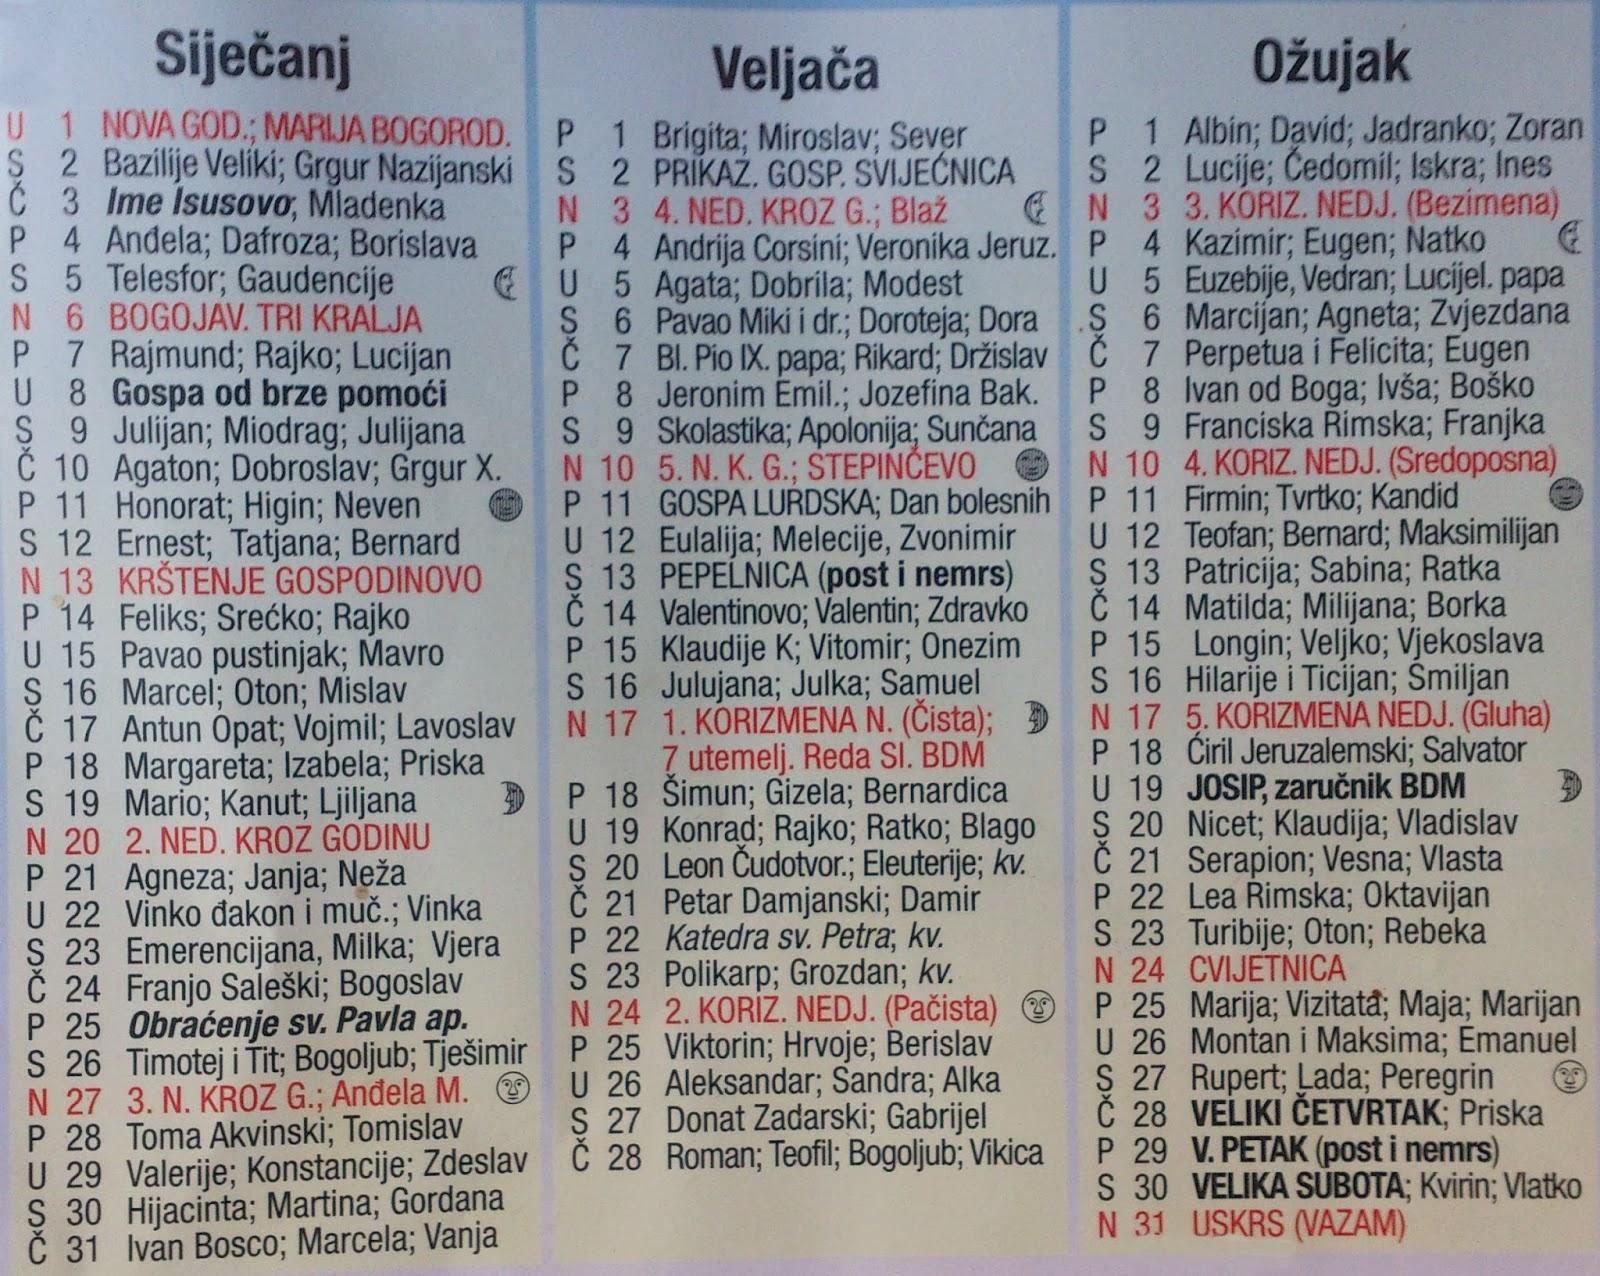 of Hrvatski Katolicki Kalendar 2015 ~ Feb 2016 watch movies online